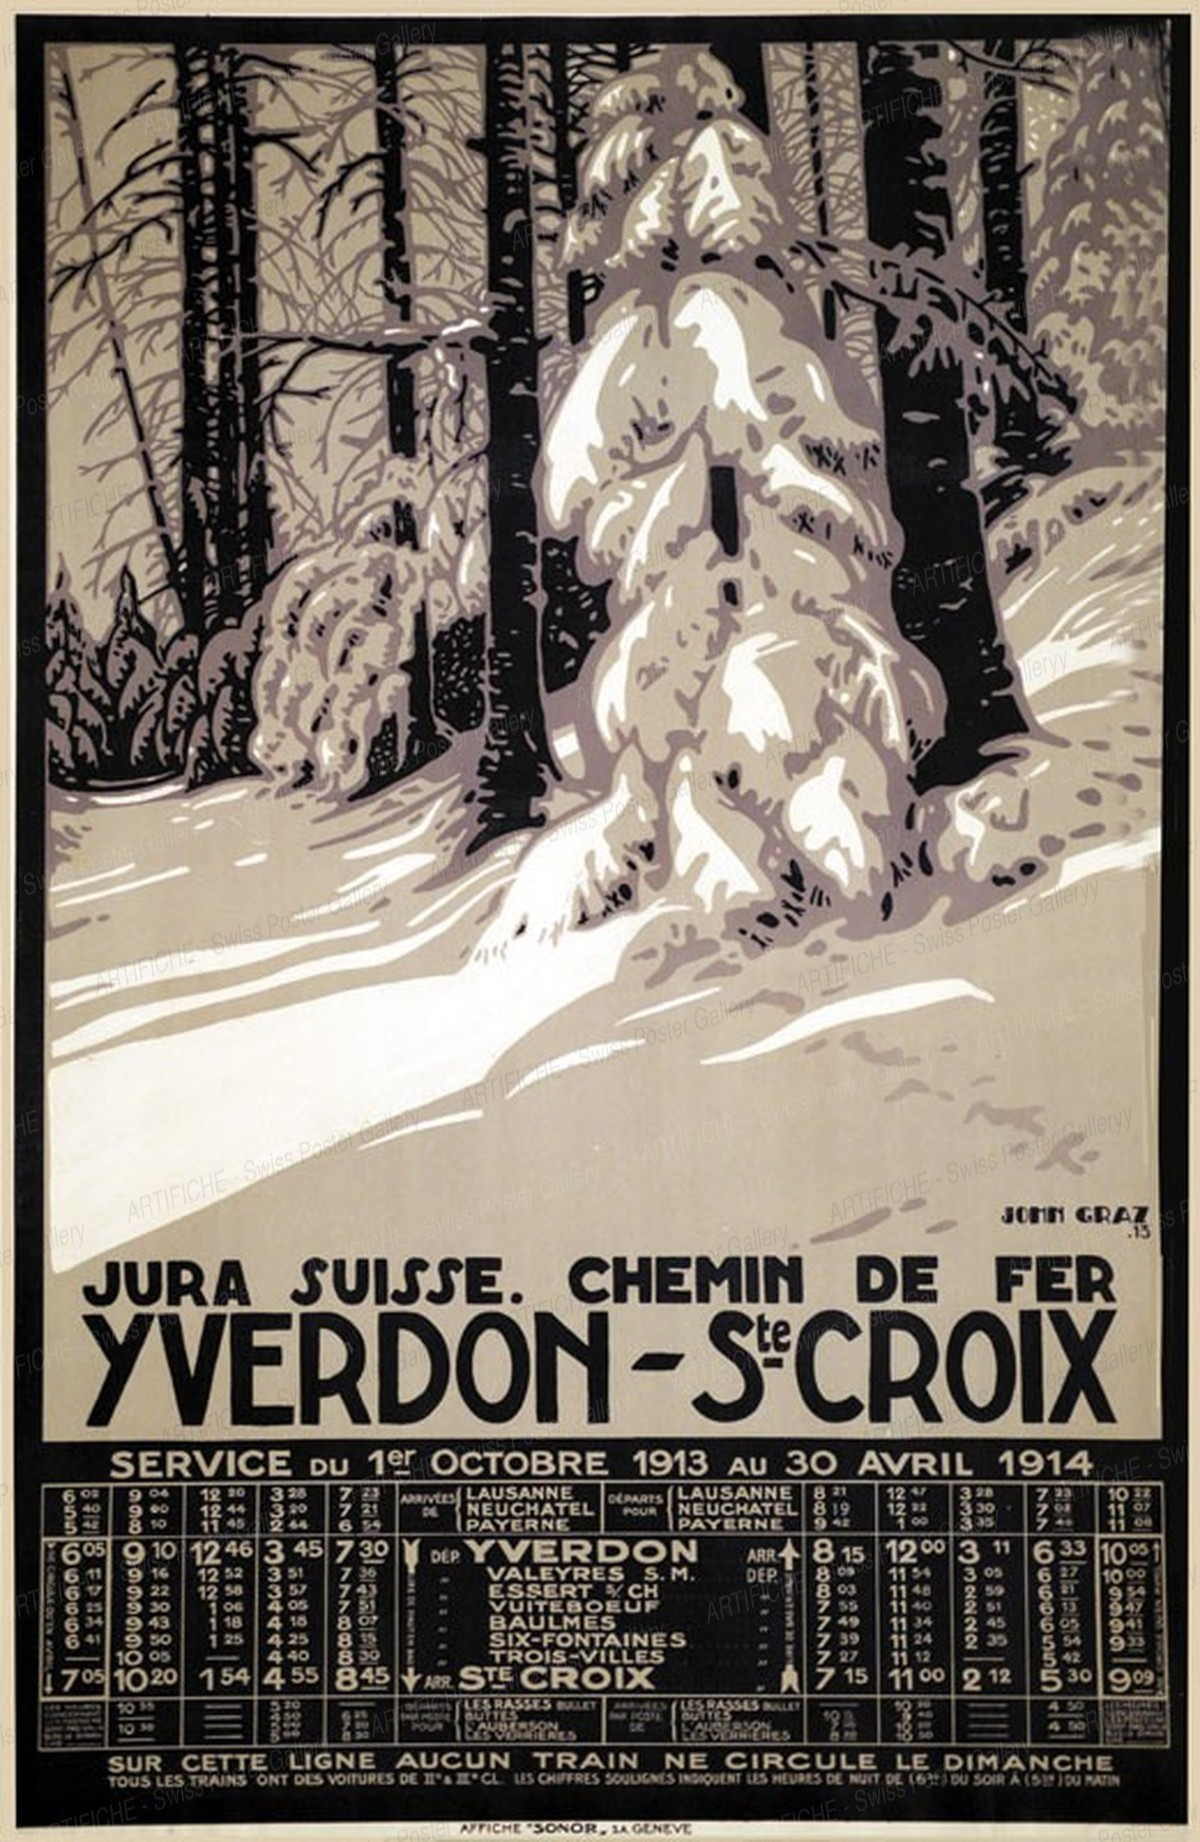 Yverdon-St. Croix, John Graz